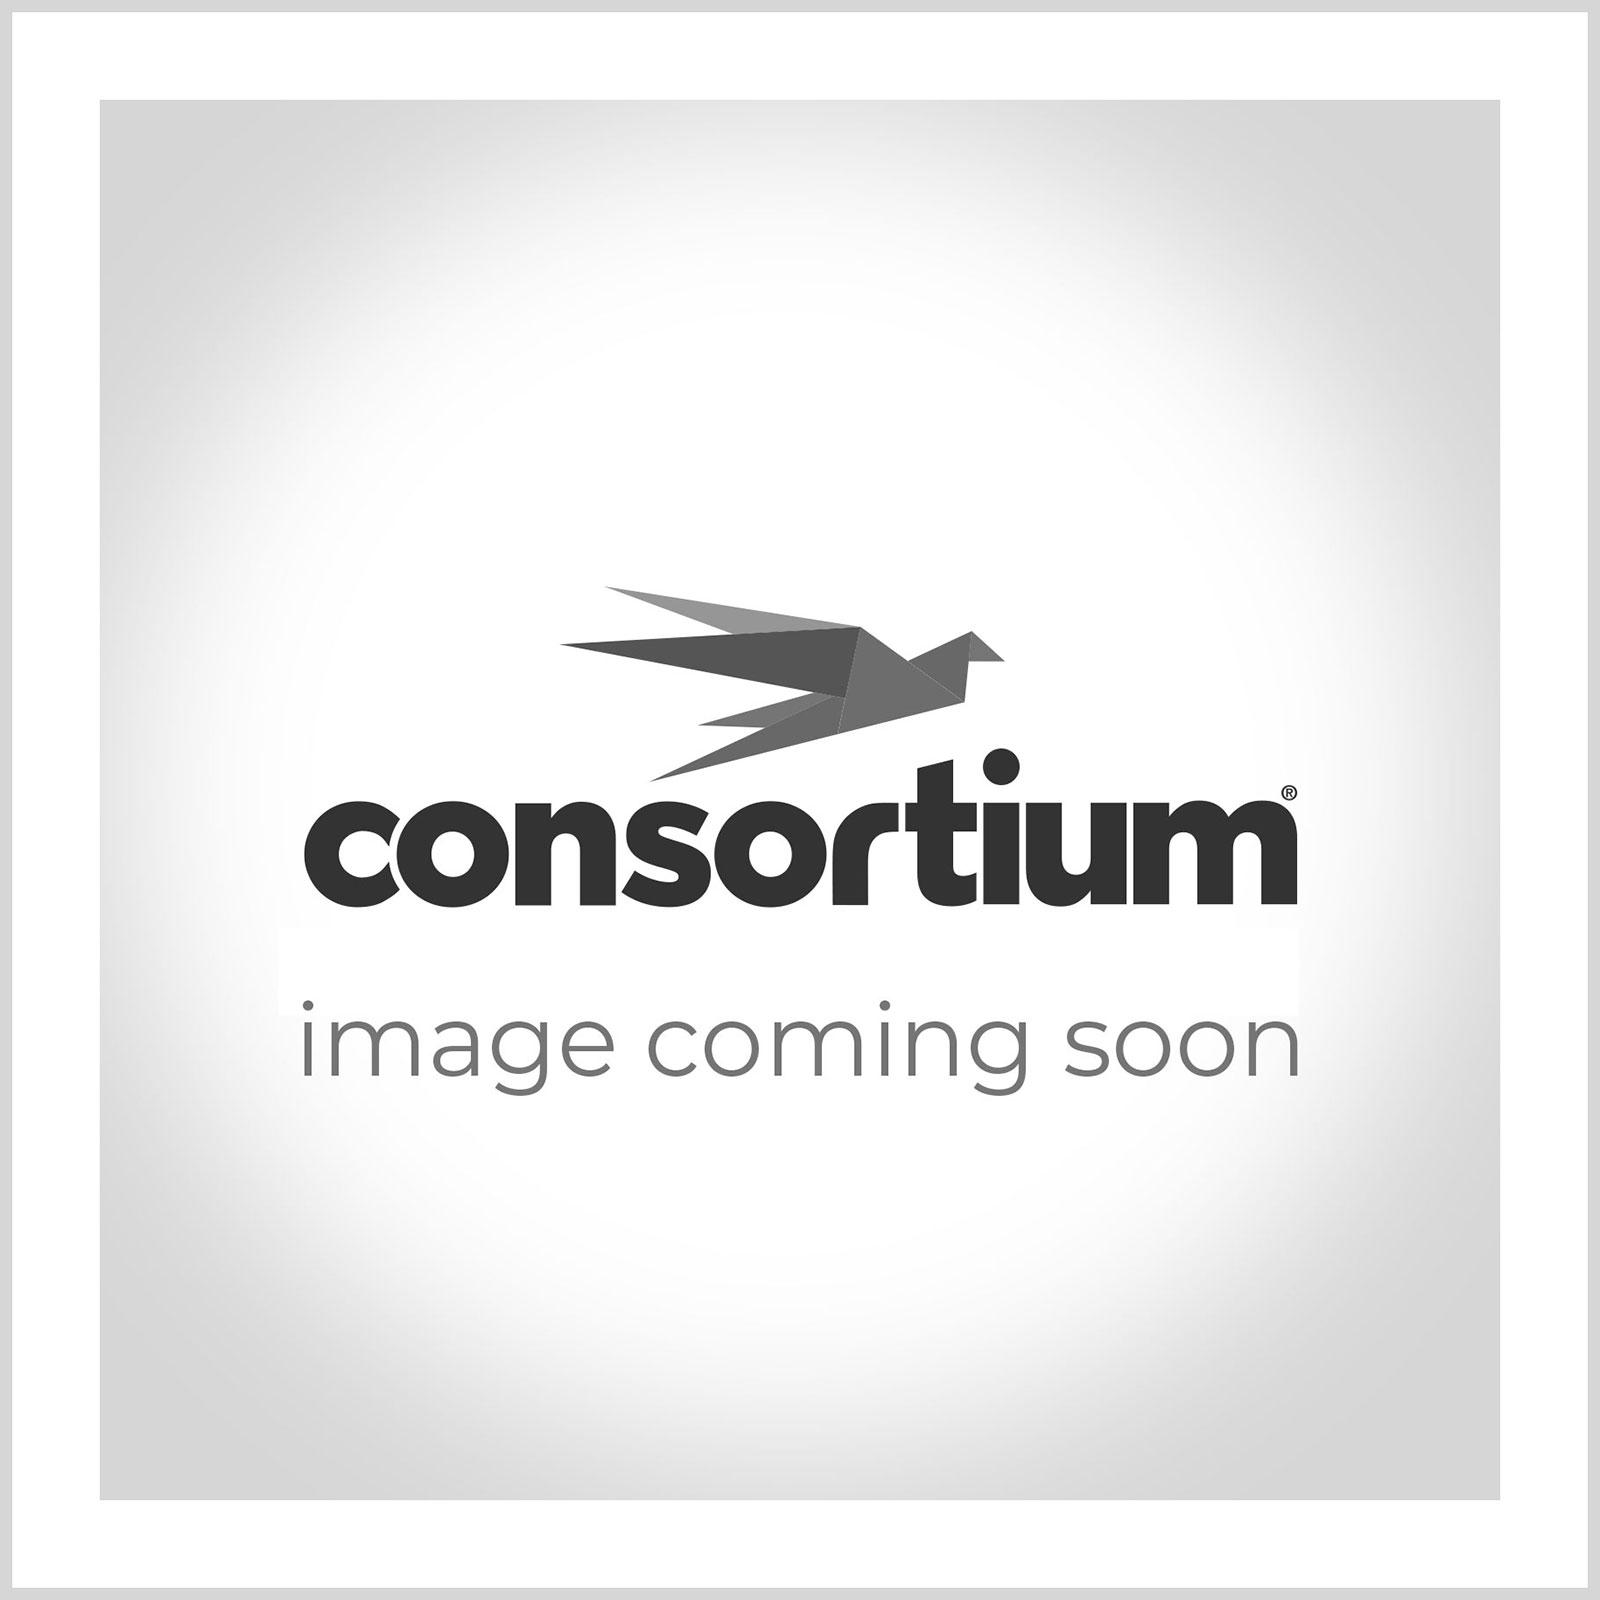 Consortium Computer Headset